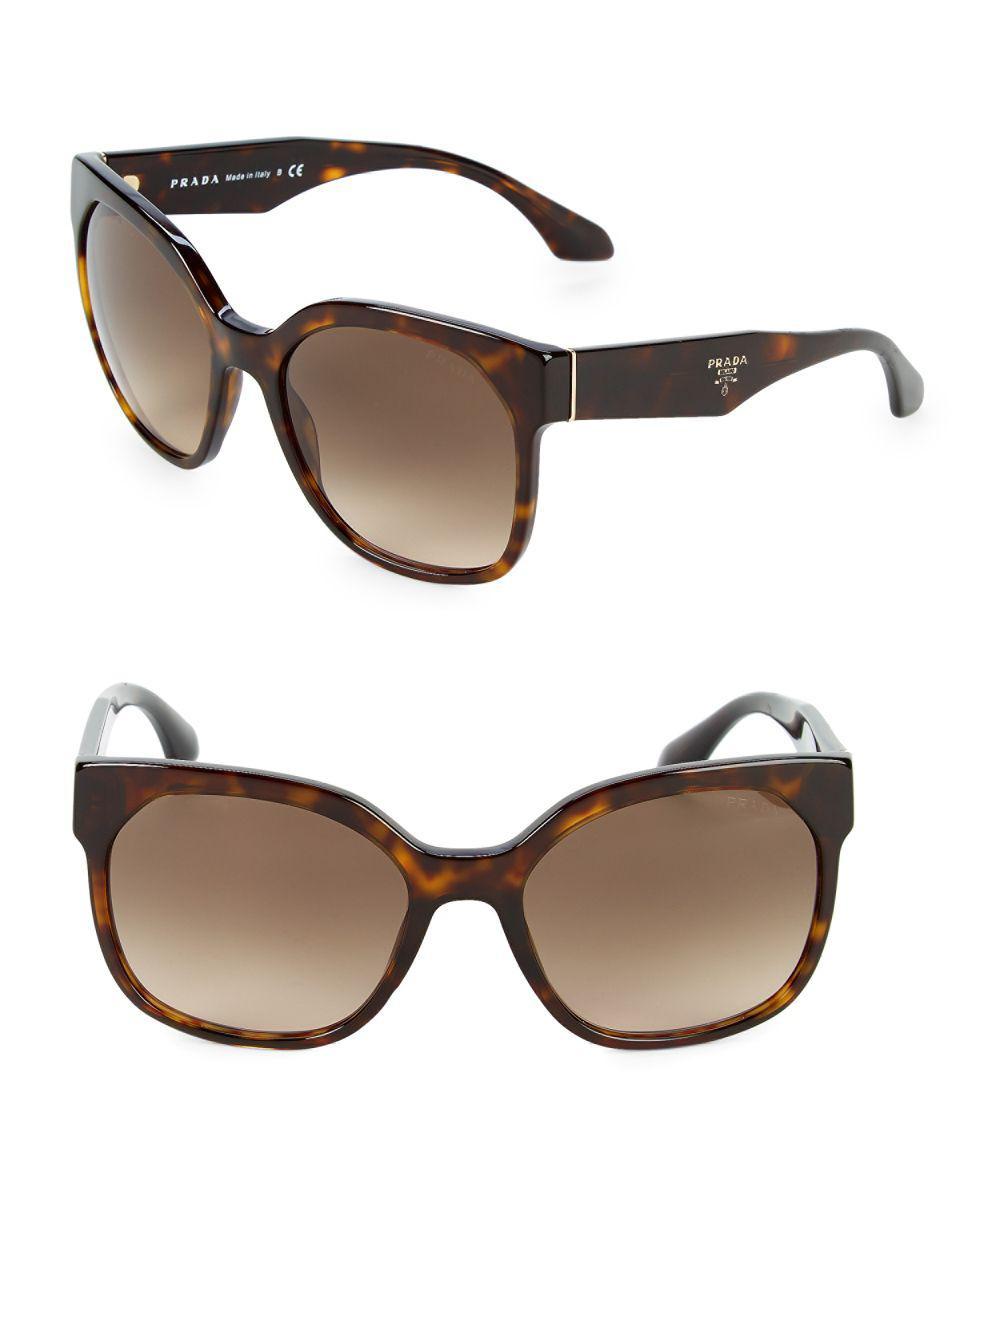 7ead48db7d ... Squared Cat-eye Sunglasses - Lyst. View fullscreen